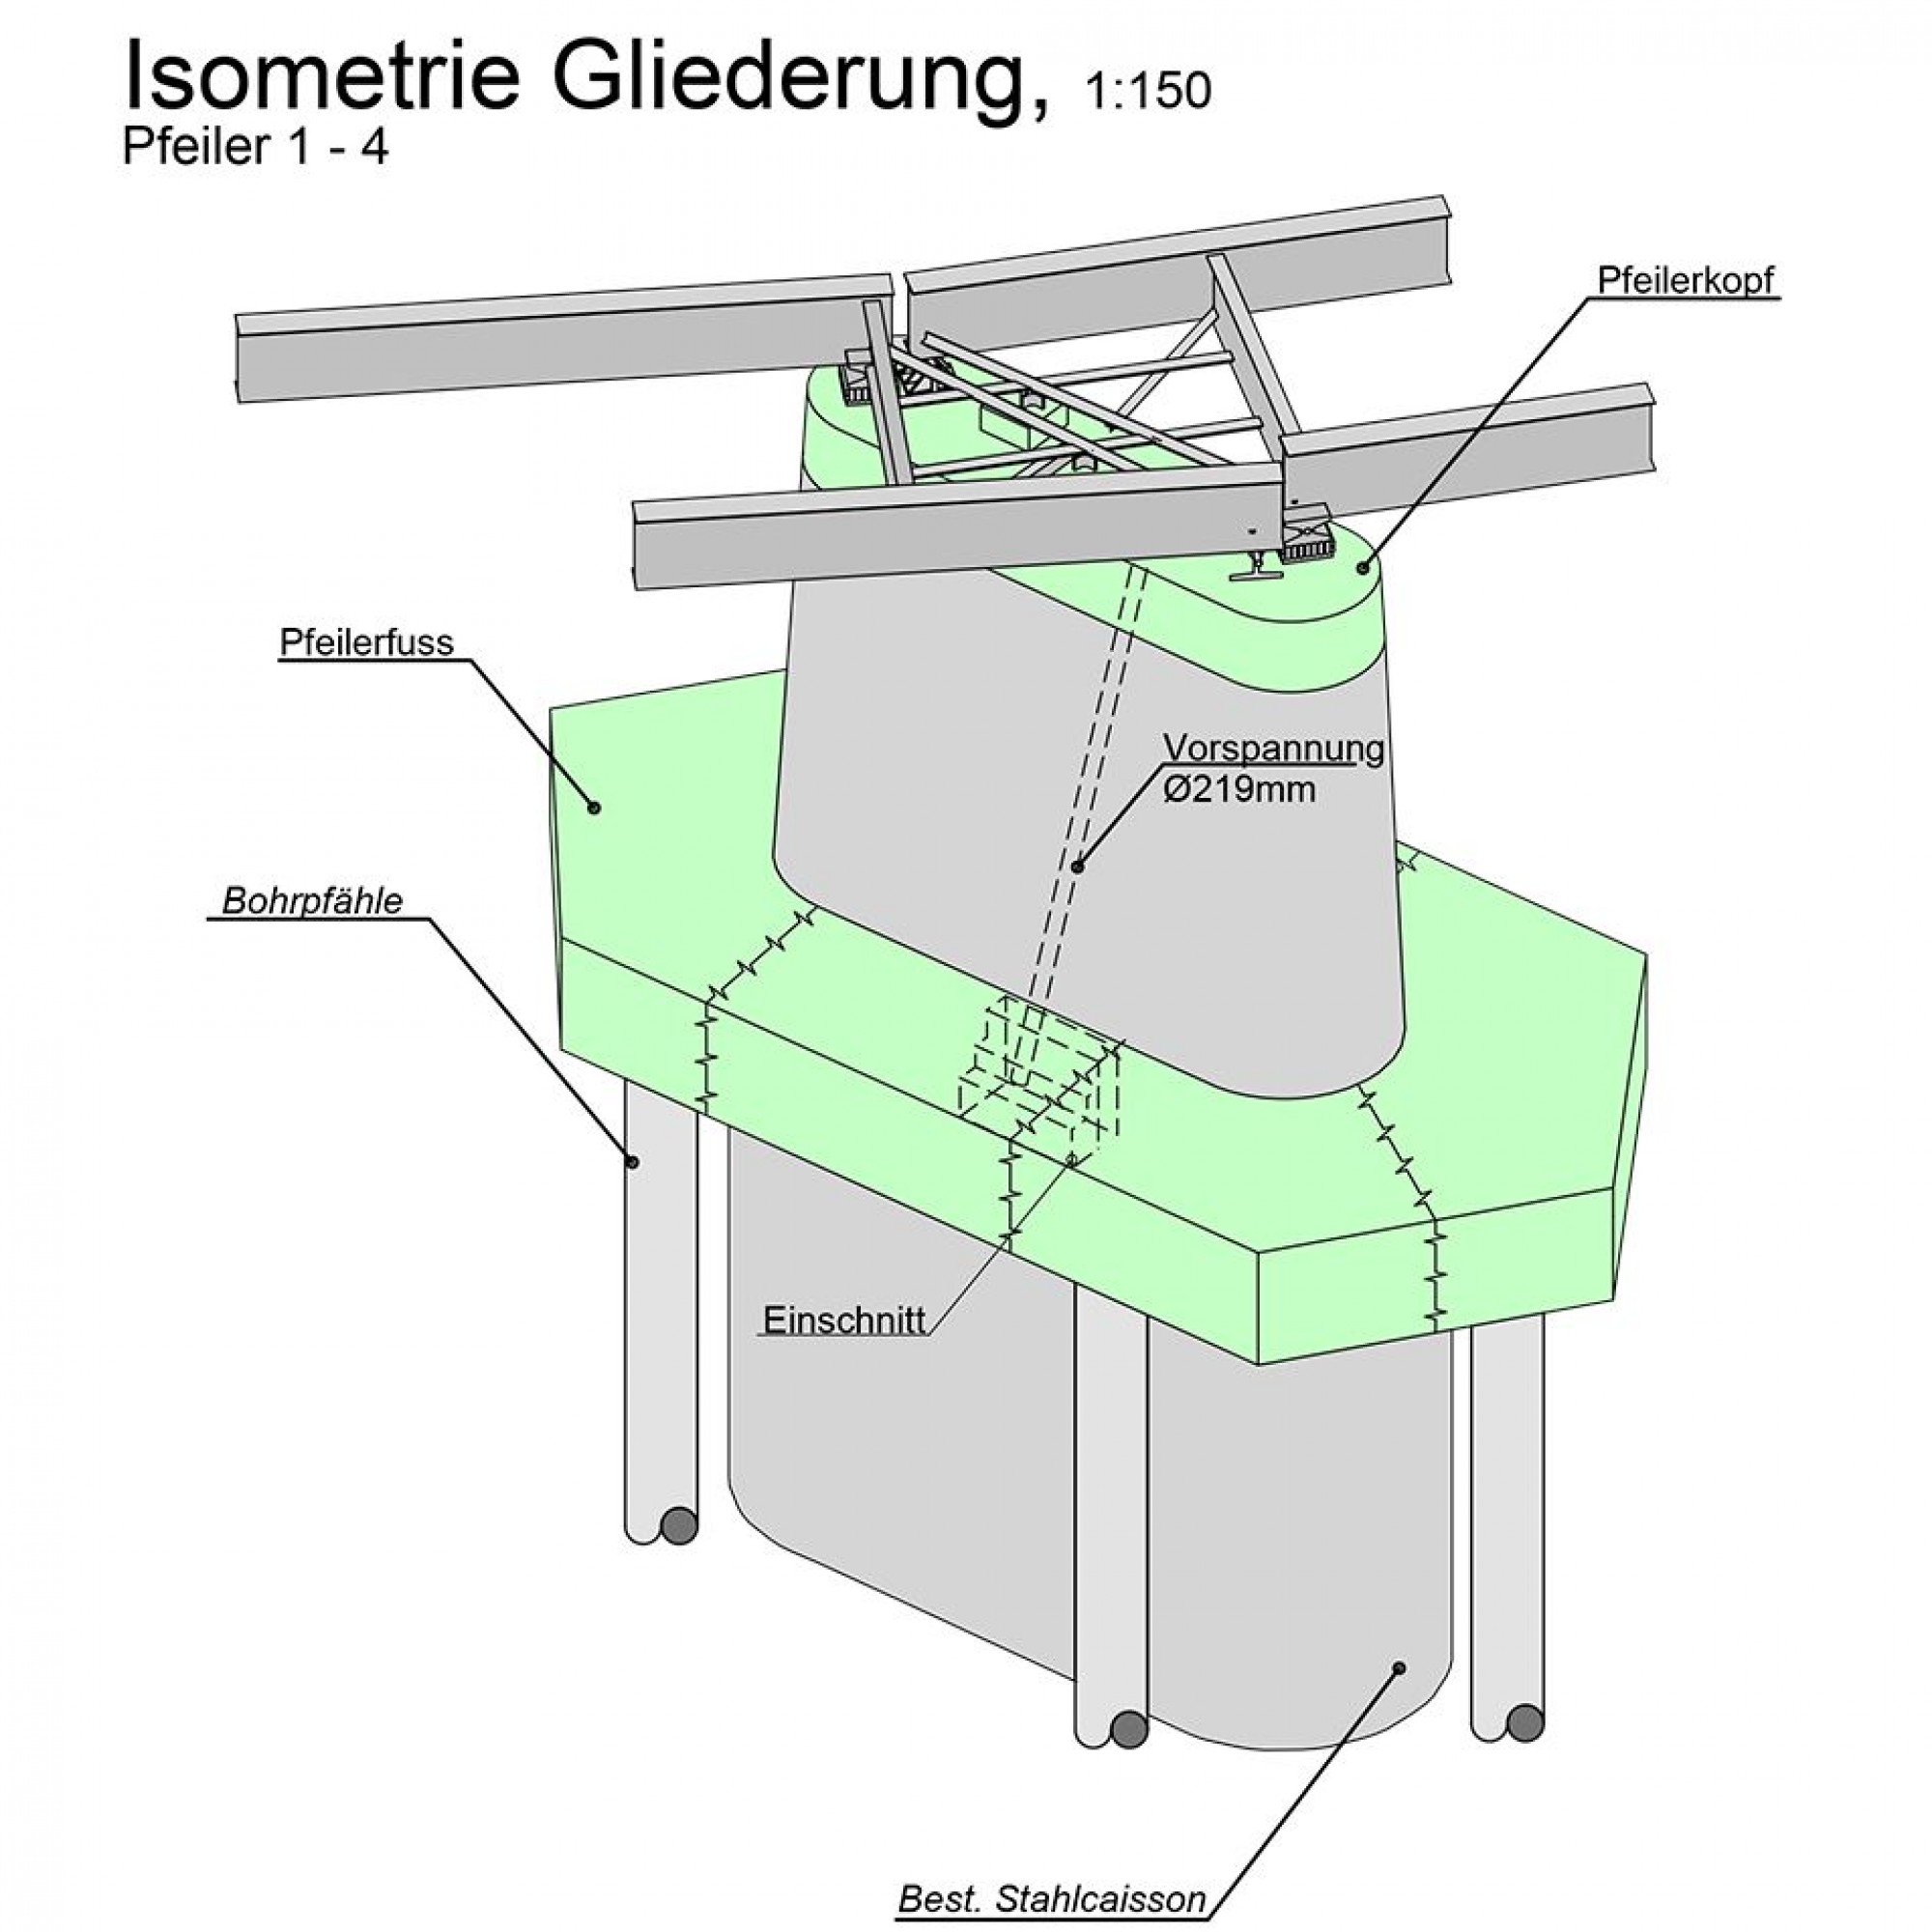 Pfeilerisometrie Aarebrücke